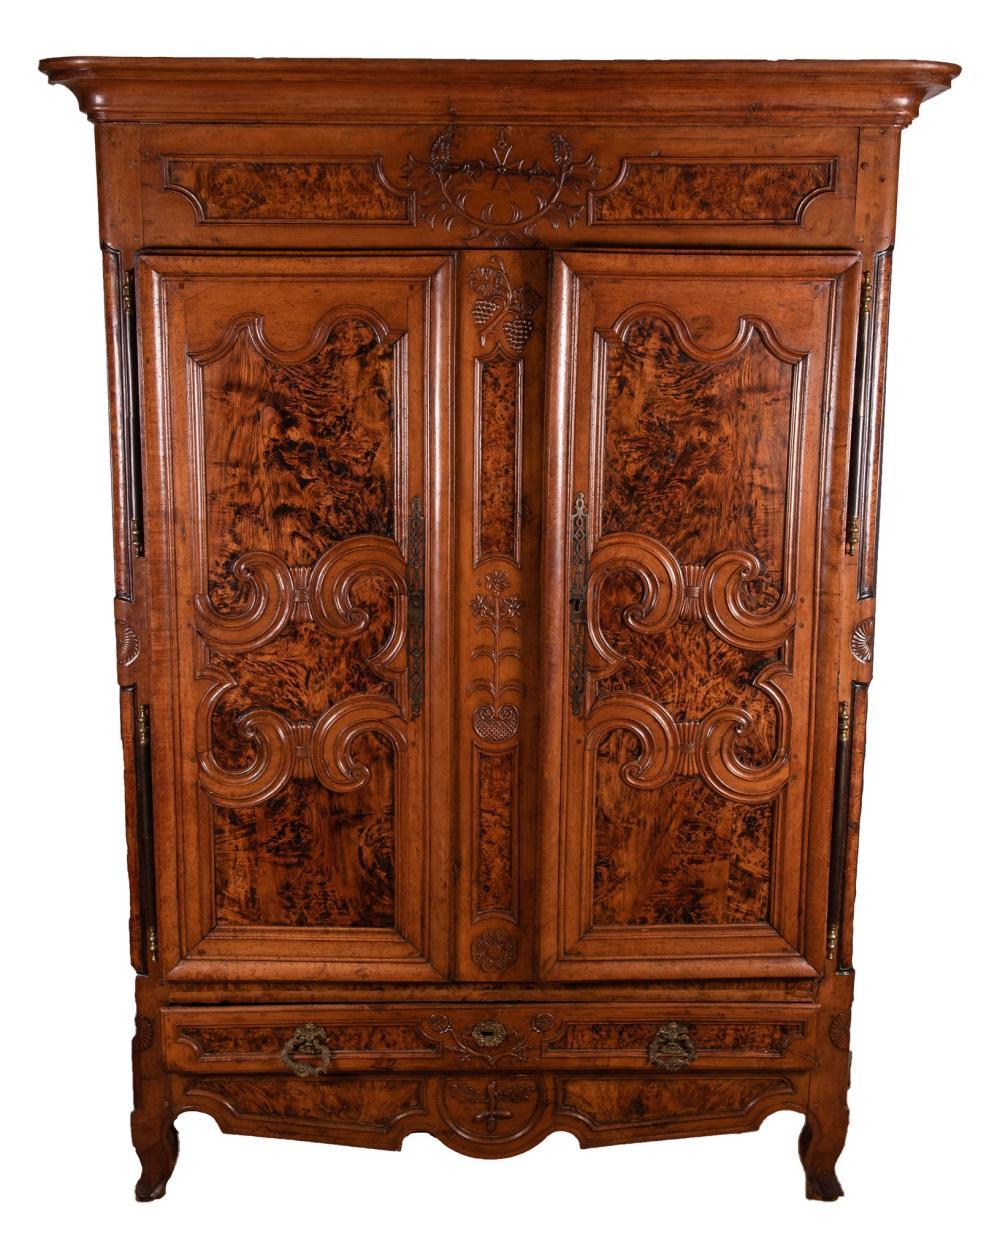 19th Century Belgian Armoire 82 x 61 x 24 inches